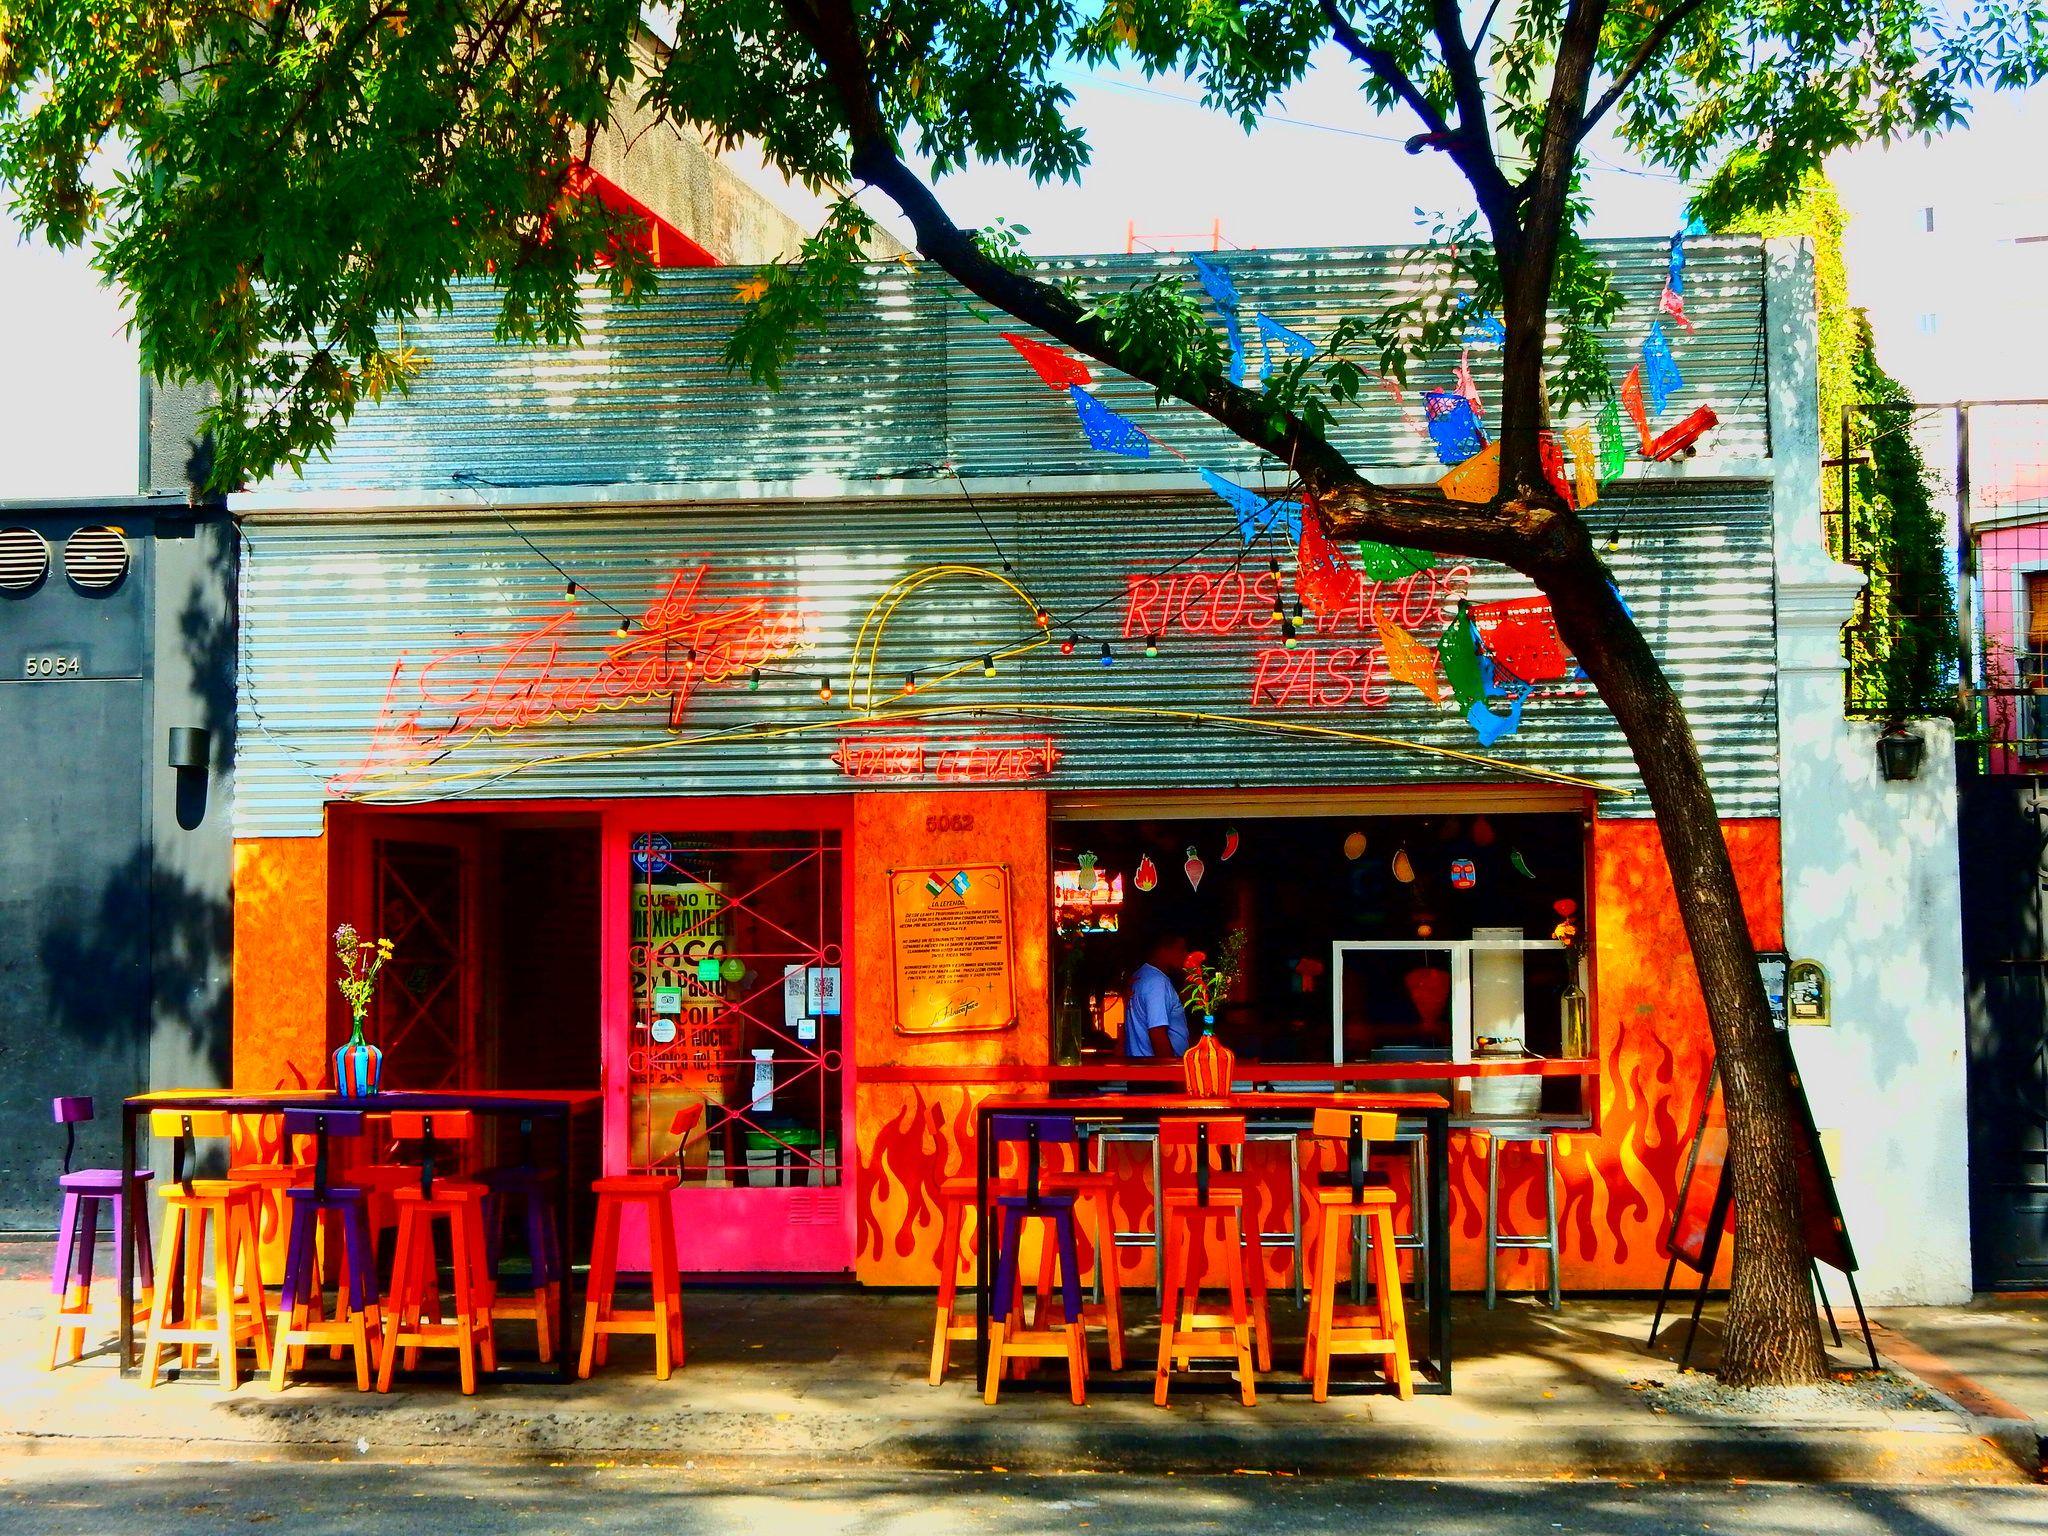 La Fabrica Del Taco Palermo Soho Buenos Aires Mexico Paraguay Food House Styles